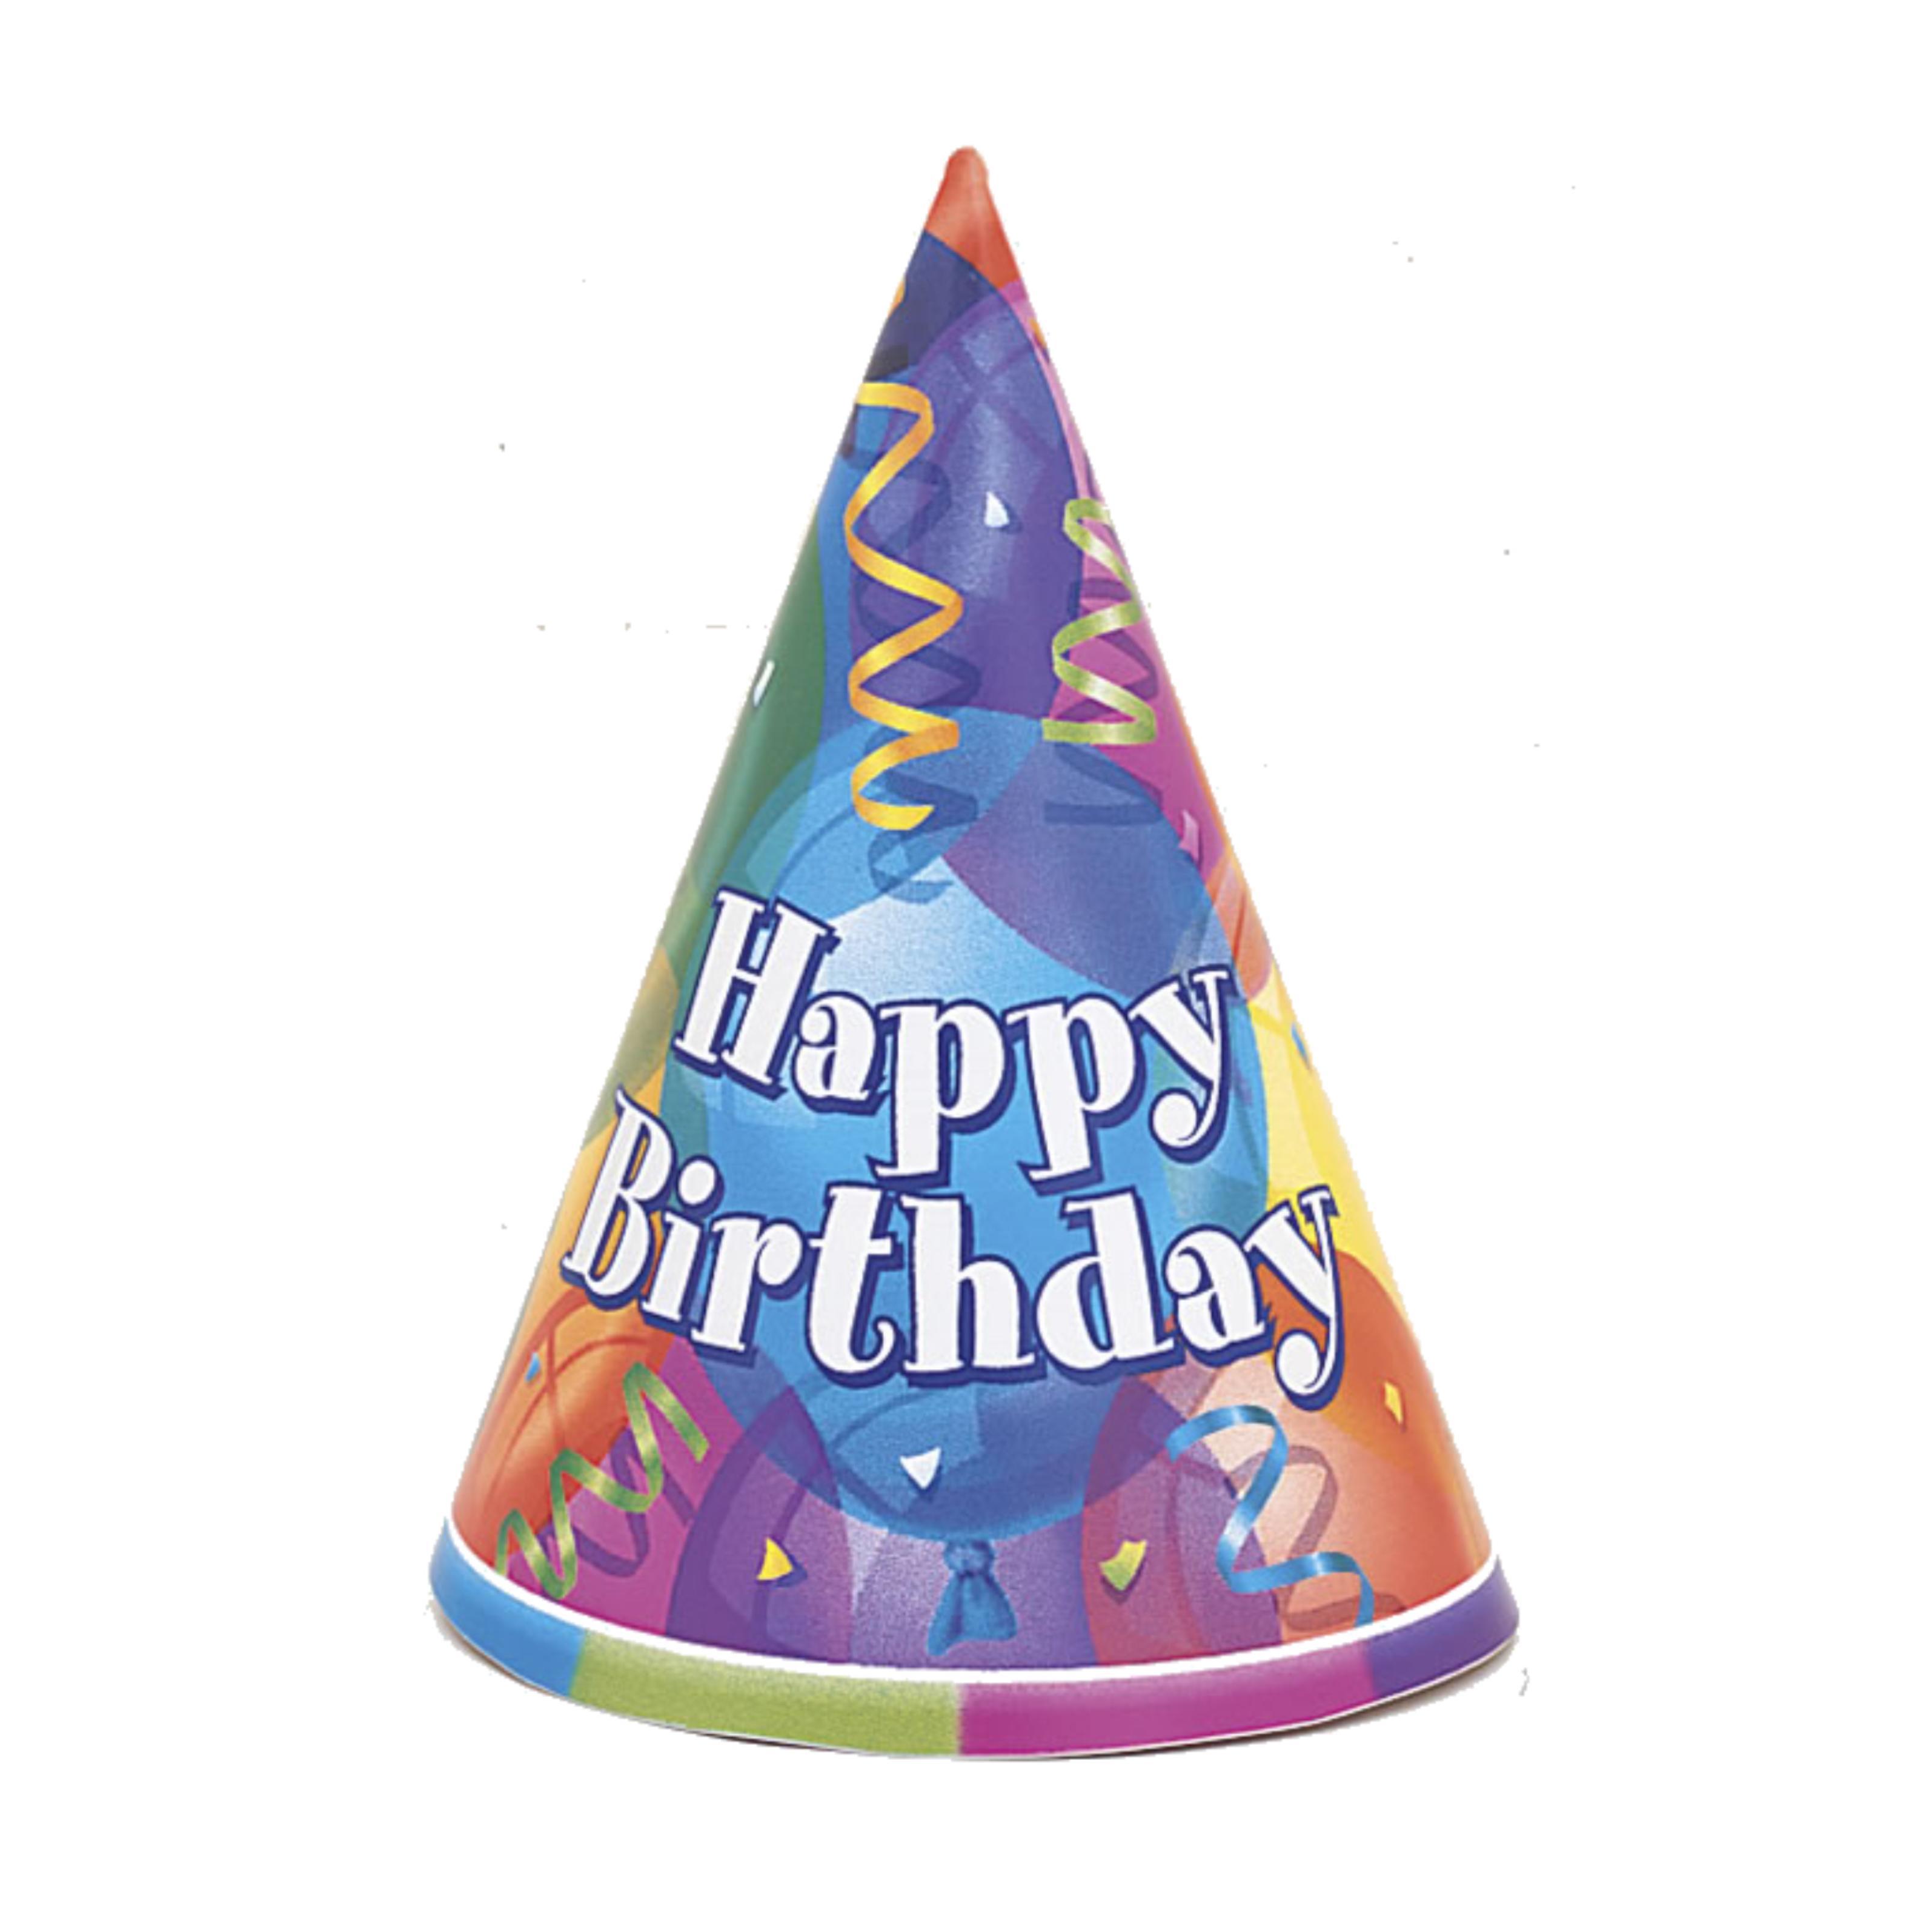 Happy birthday hat clipart 5